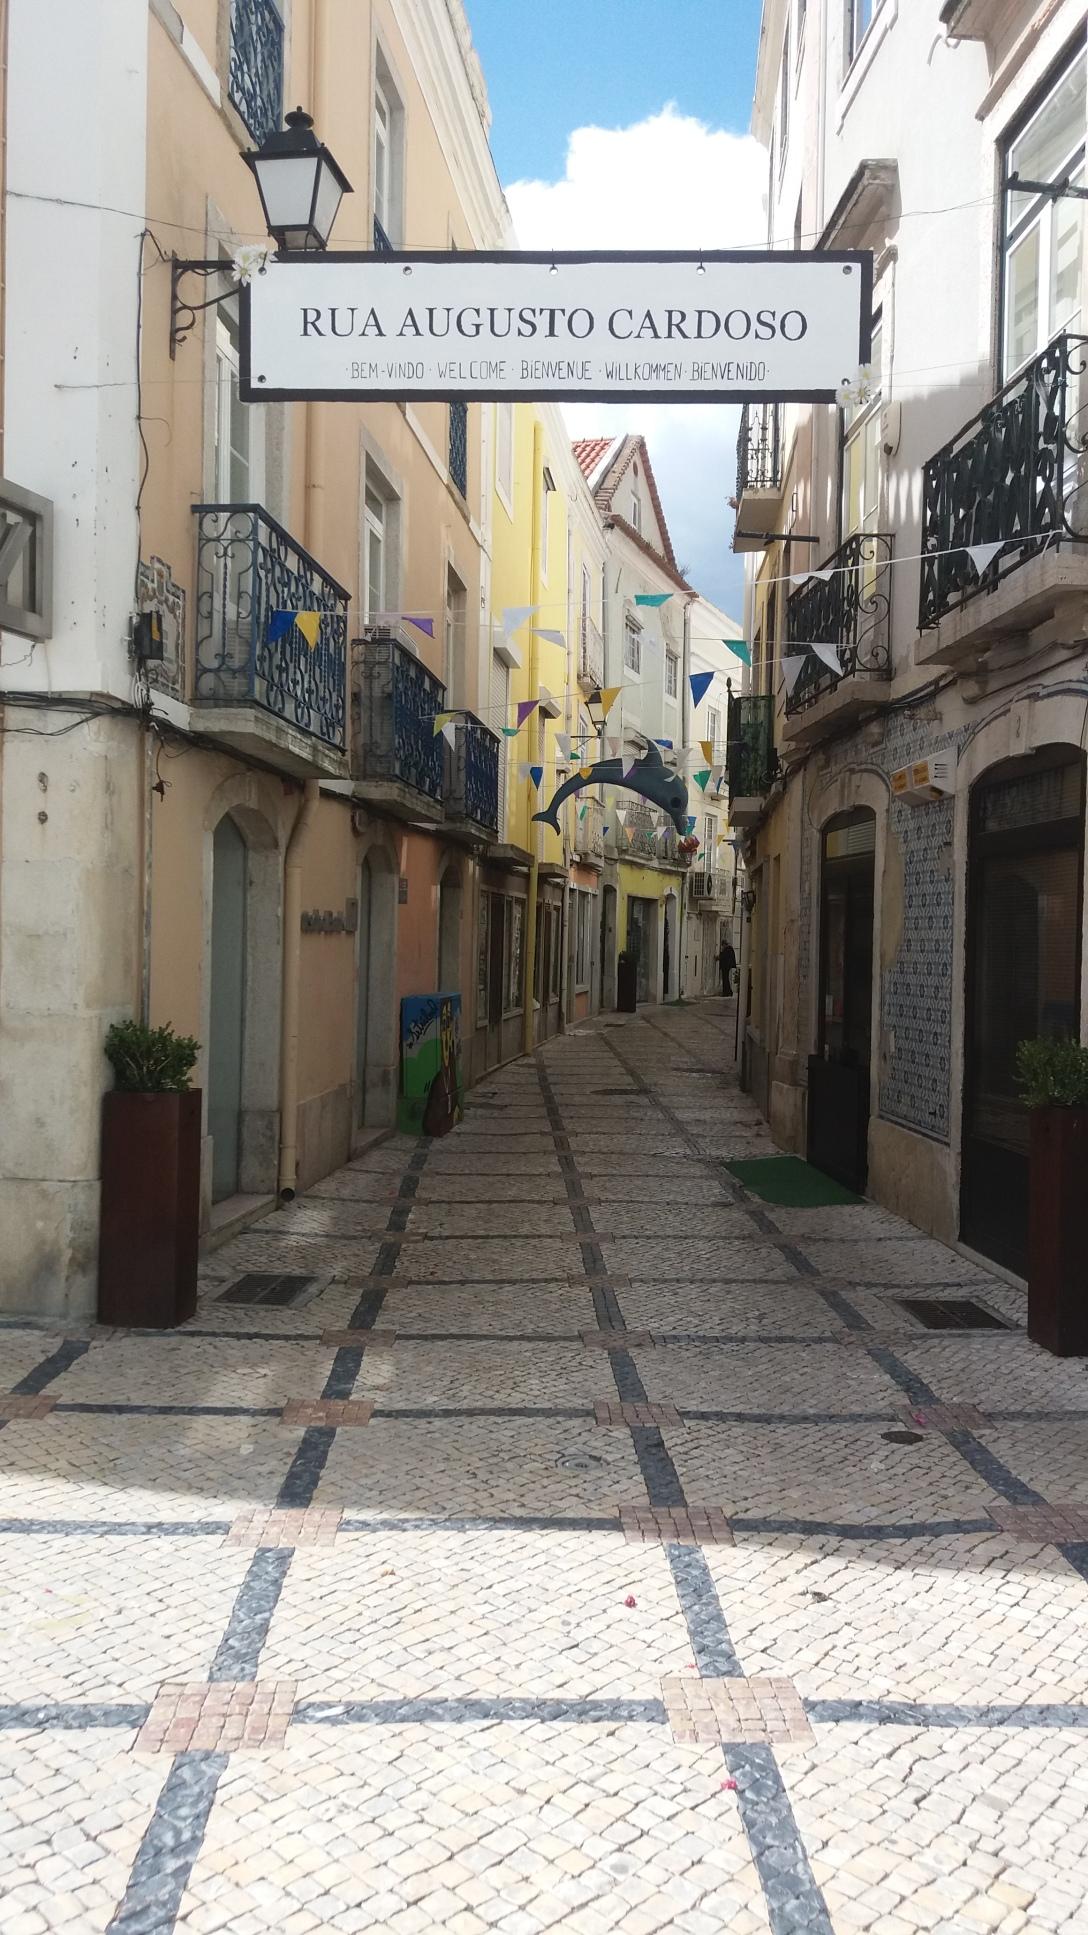 Rua Augusto Cardoso